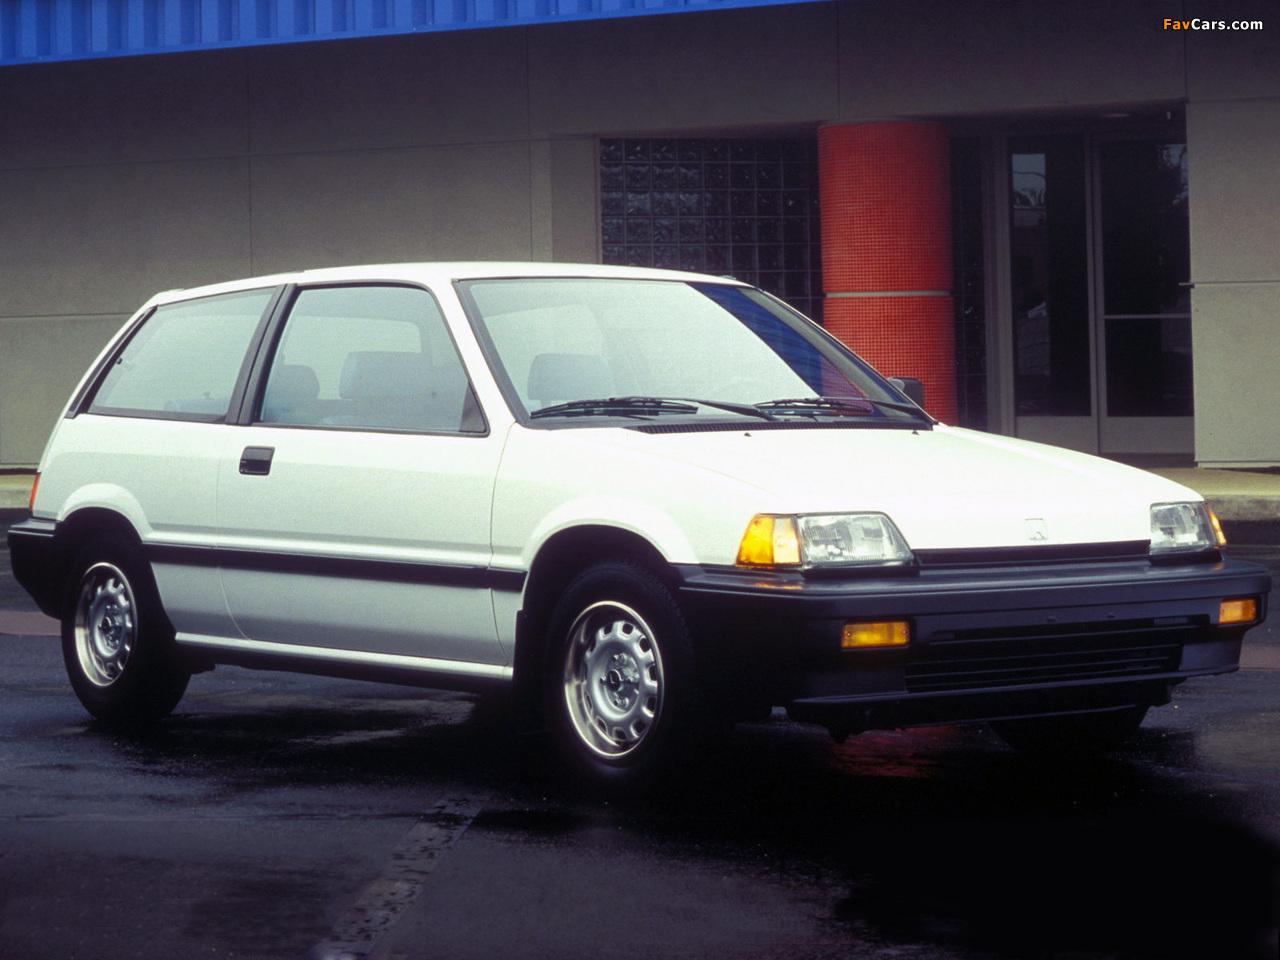 honda civic hatchback usspec 1983�87 photos 1280x960